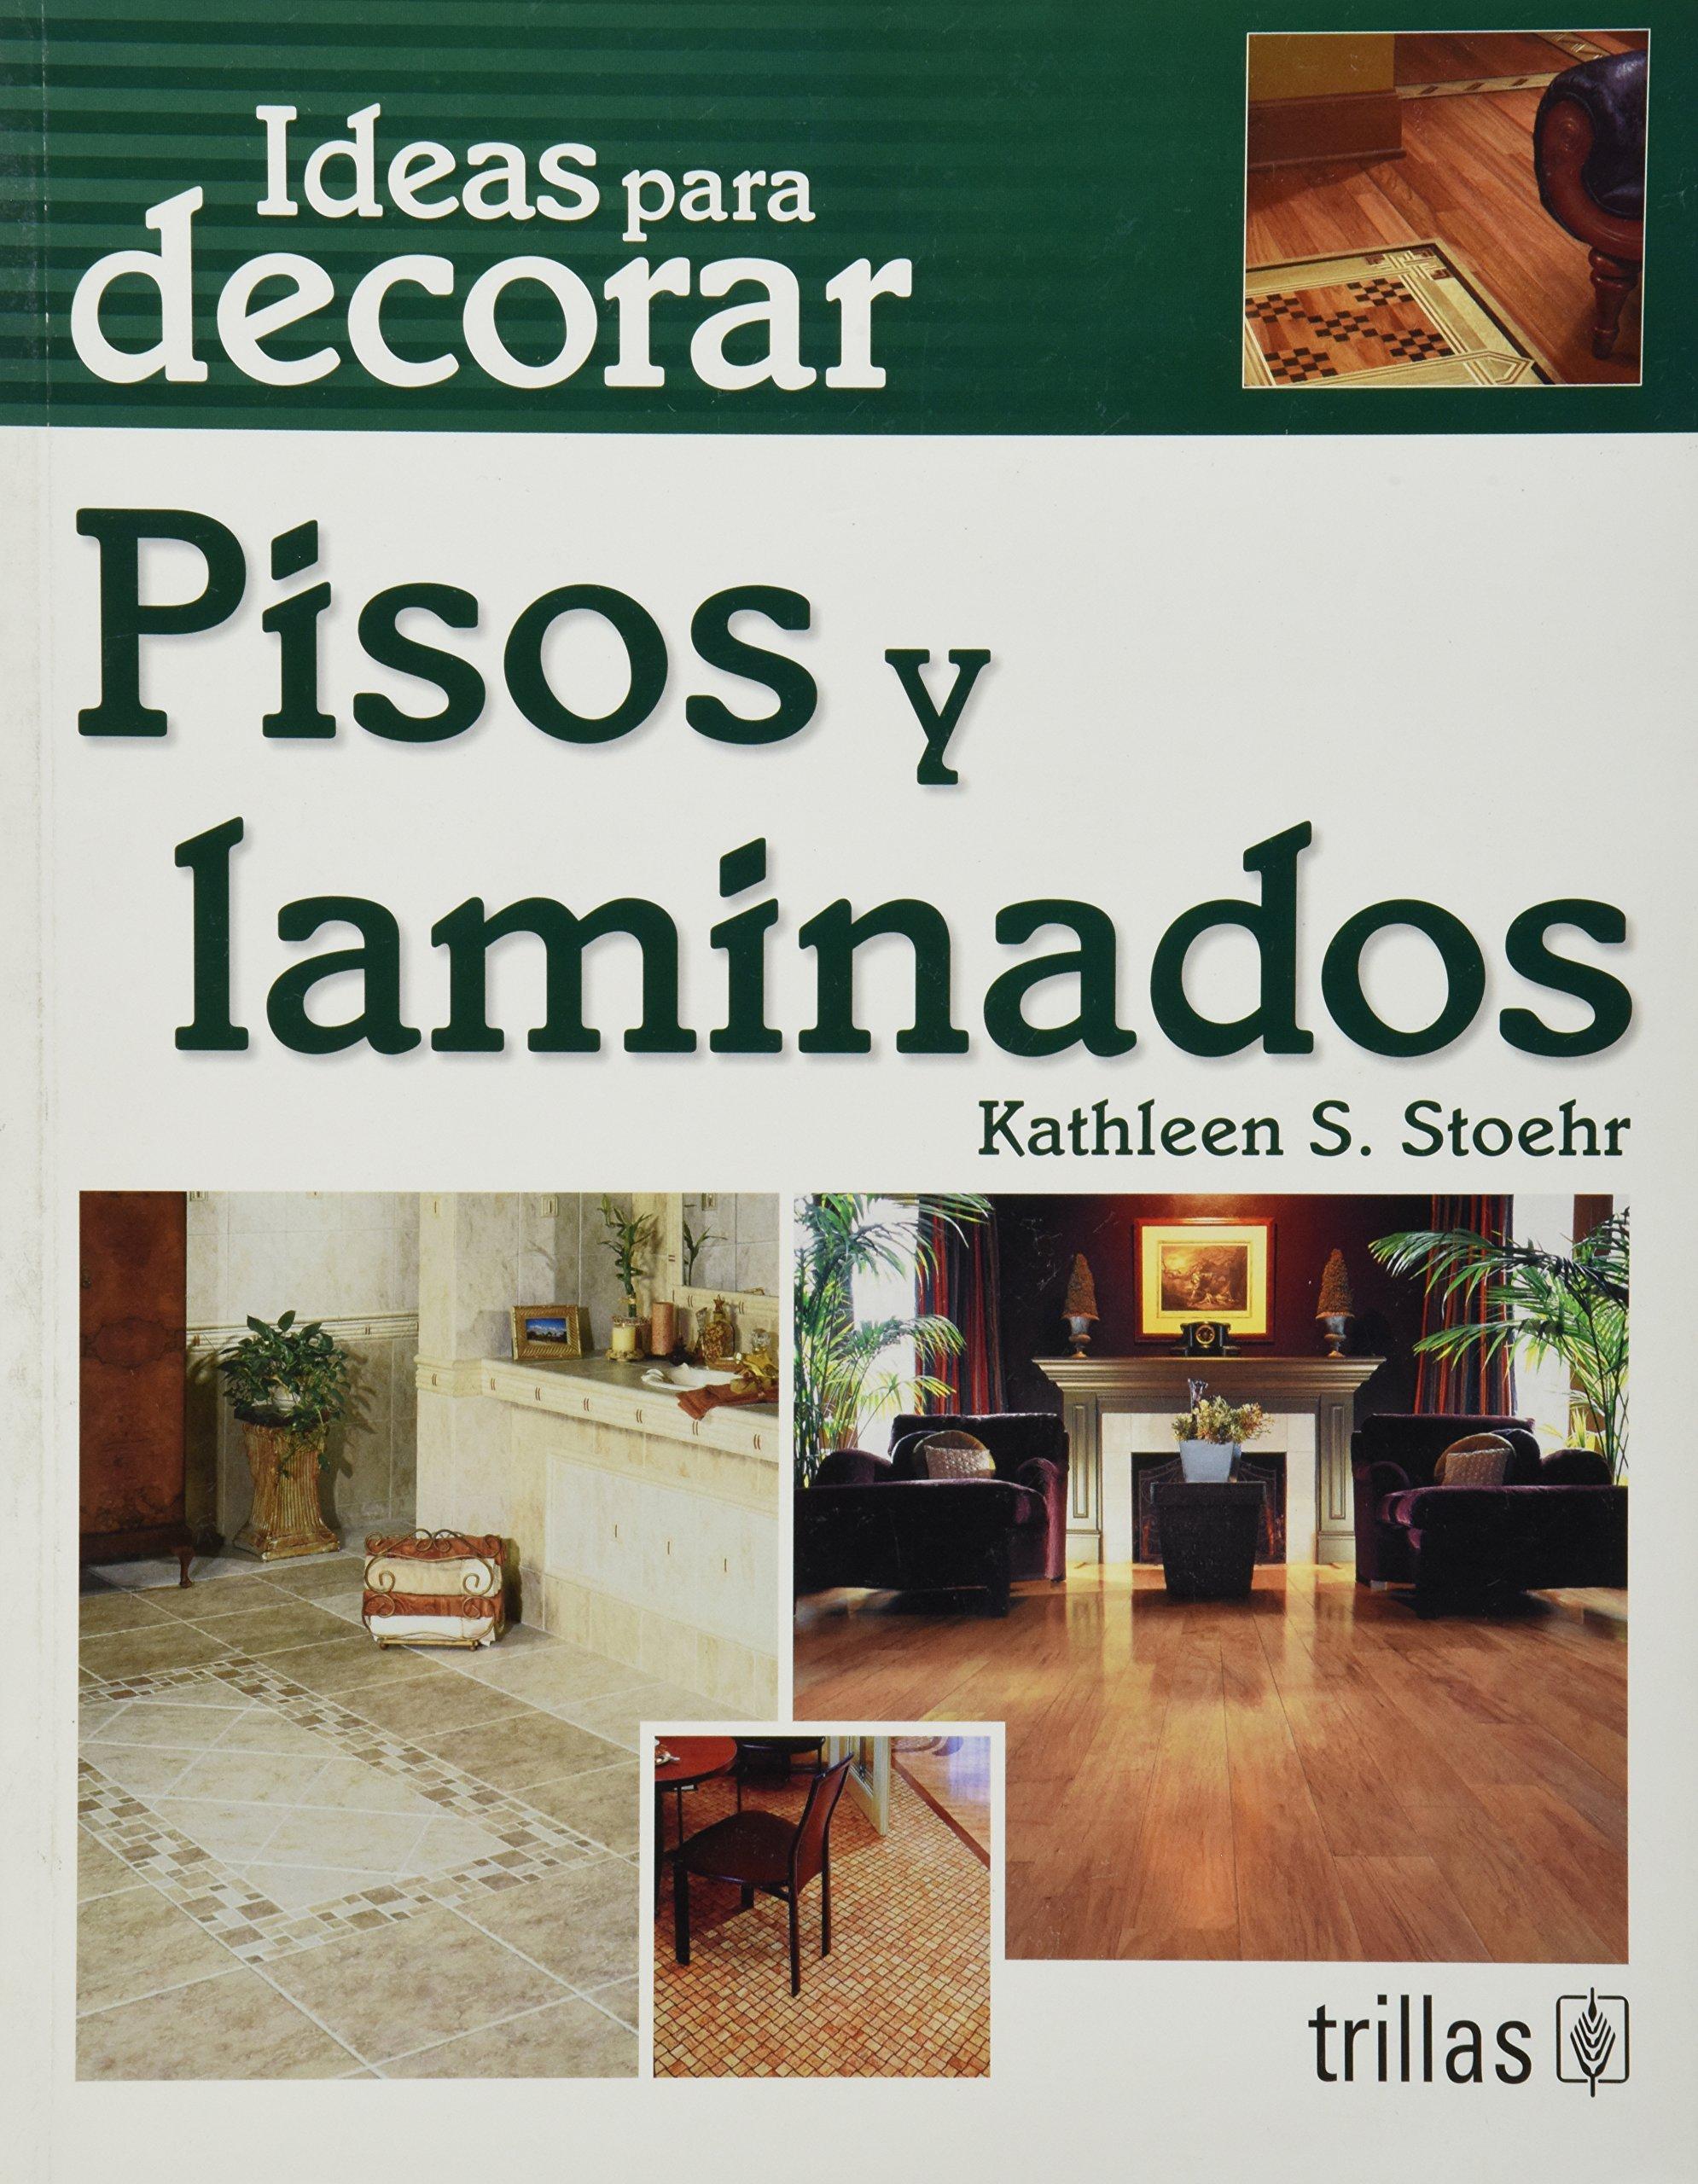 Pisos y laminados / Dream Floors: Ideas para decorar / Hundreds of Design Ideas for Every Kind of Floor (Spanish Edition) by Editorial Trillas Sa De Cv (Image #1)